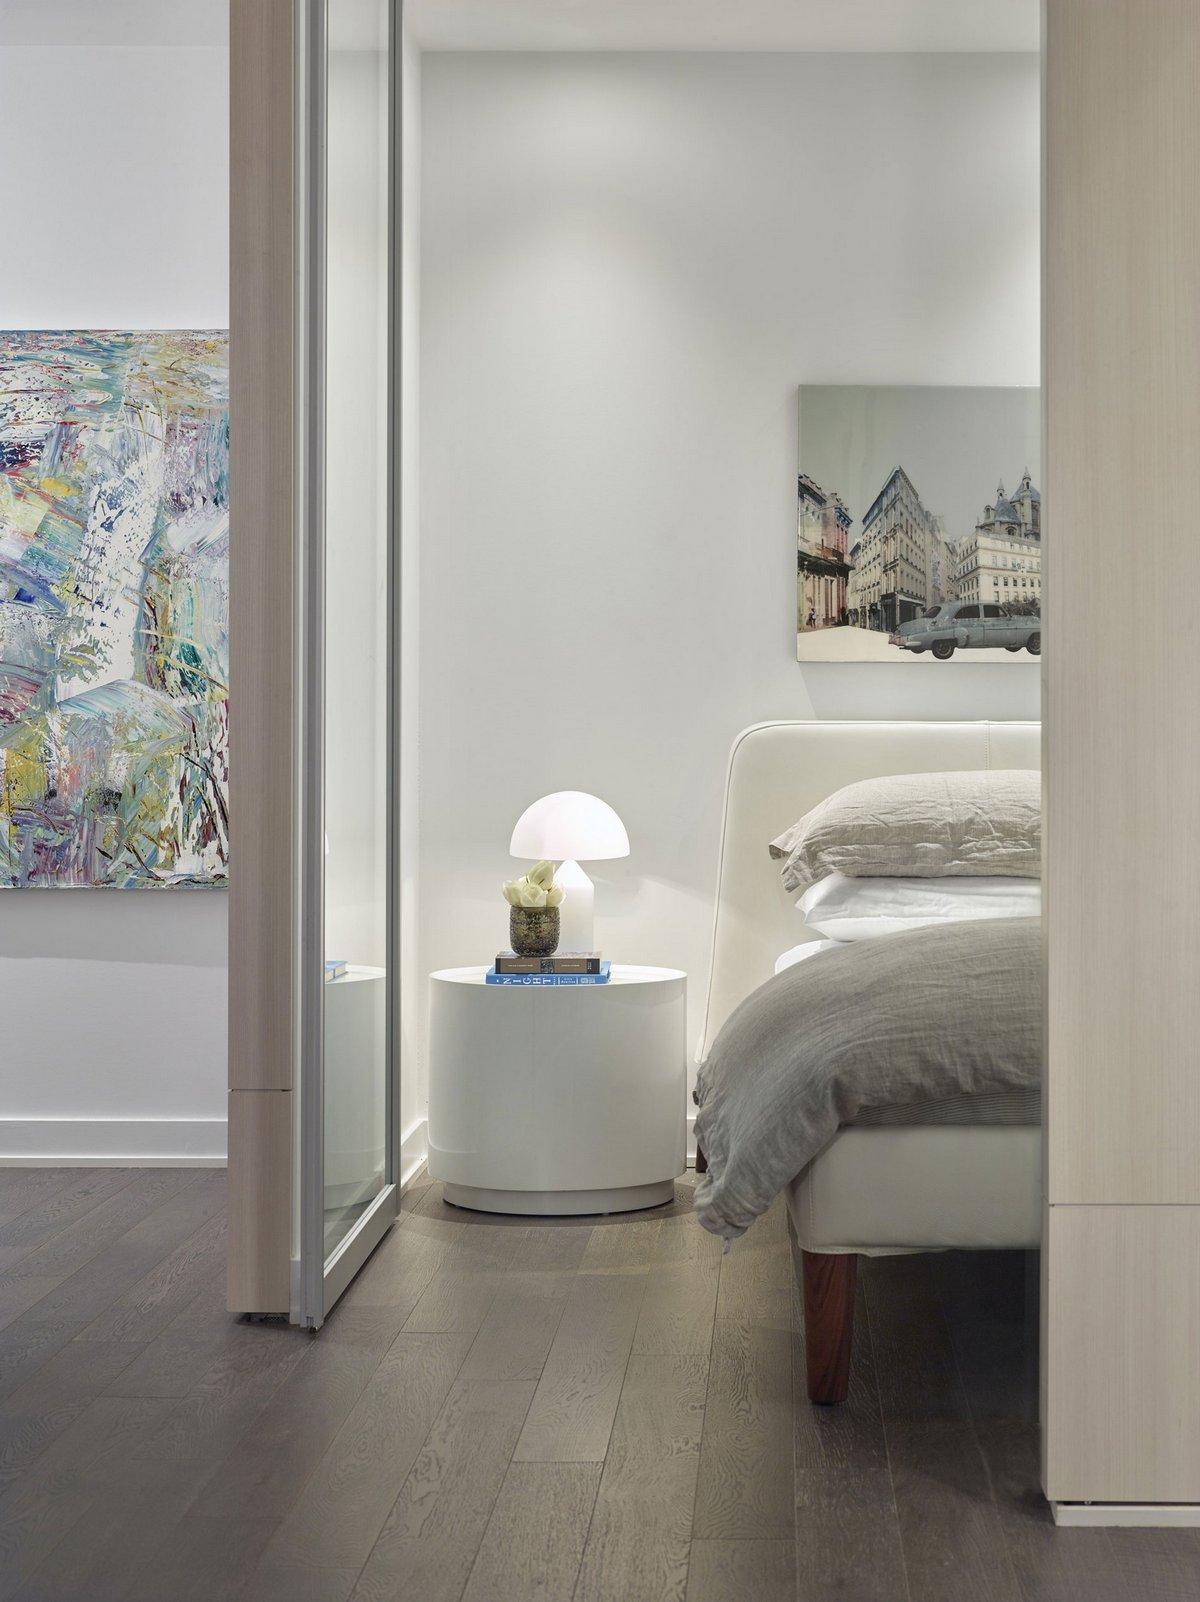 Art Shoppe Lofts + Condos, арт-пространство, арт пространство квартира, арт лофт пространство, шоурум лофт, лофт арт, Cecconi Simone